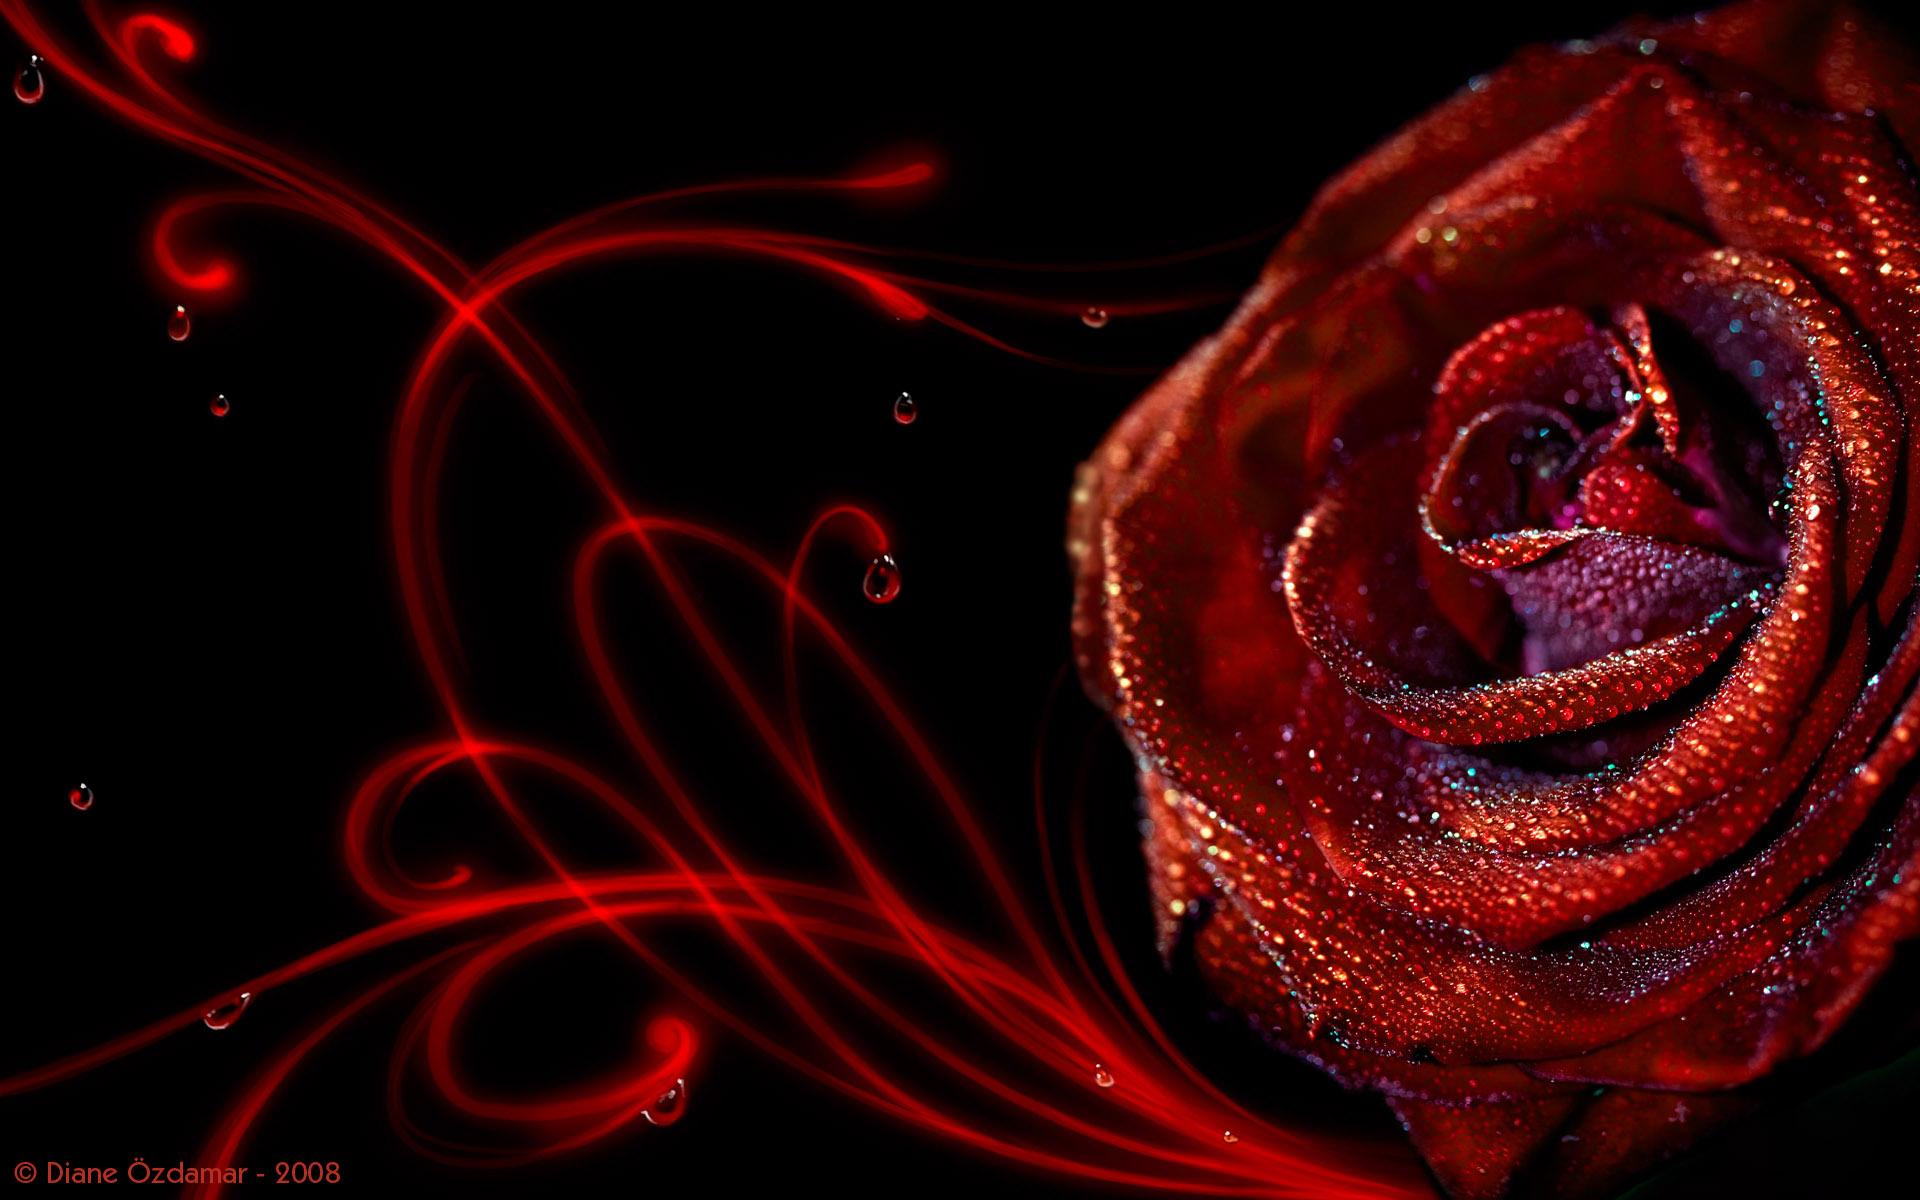 3d Rose Wallpapers Free Download 1344x870 Download Hd Wallpaper Wallpapertip